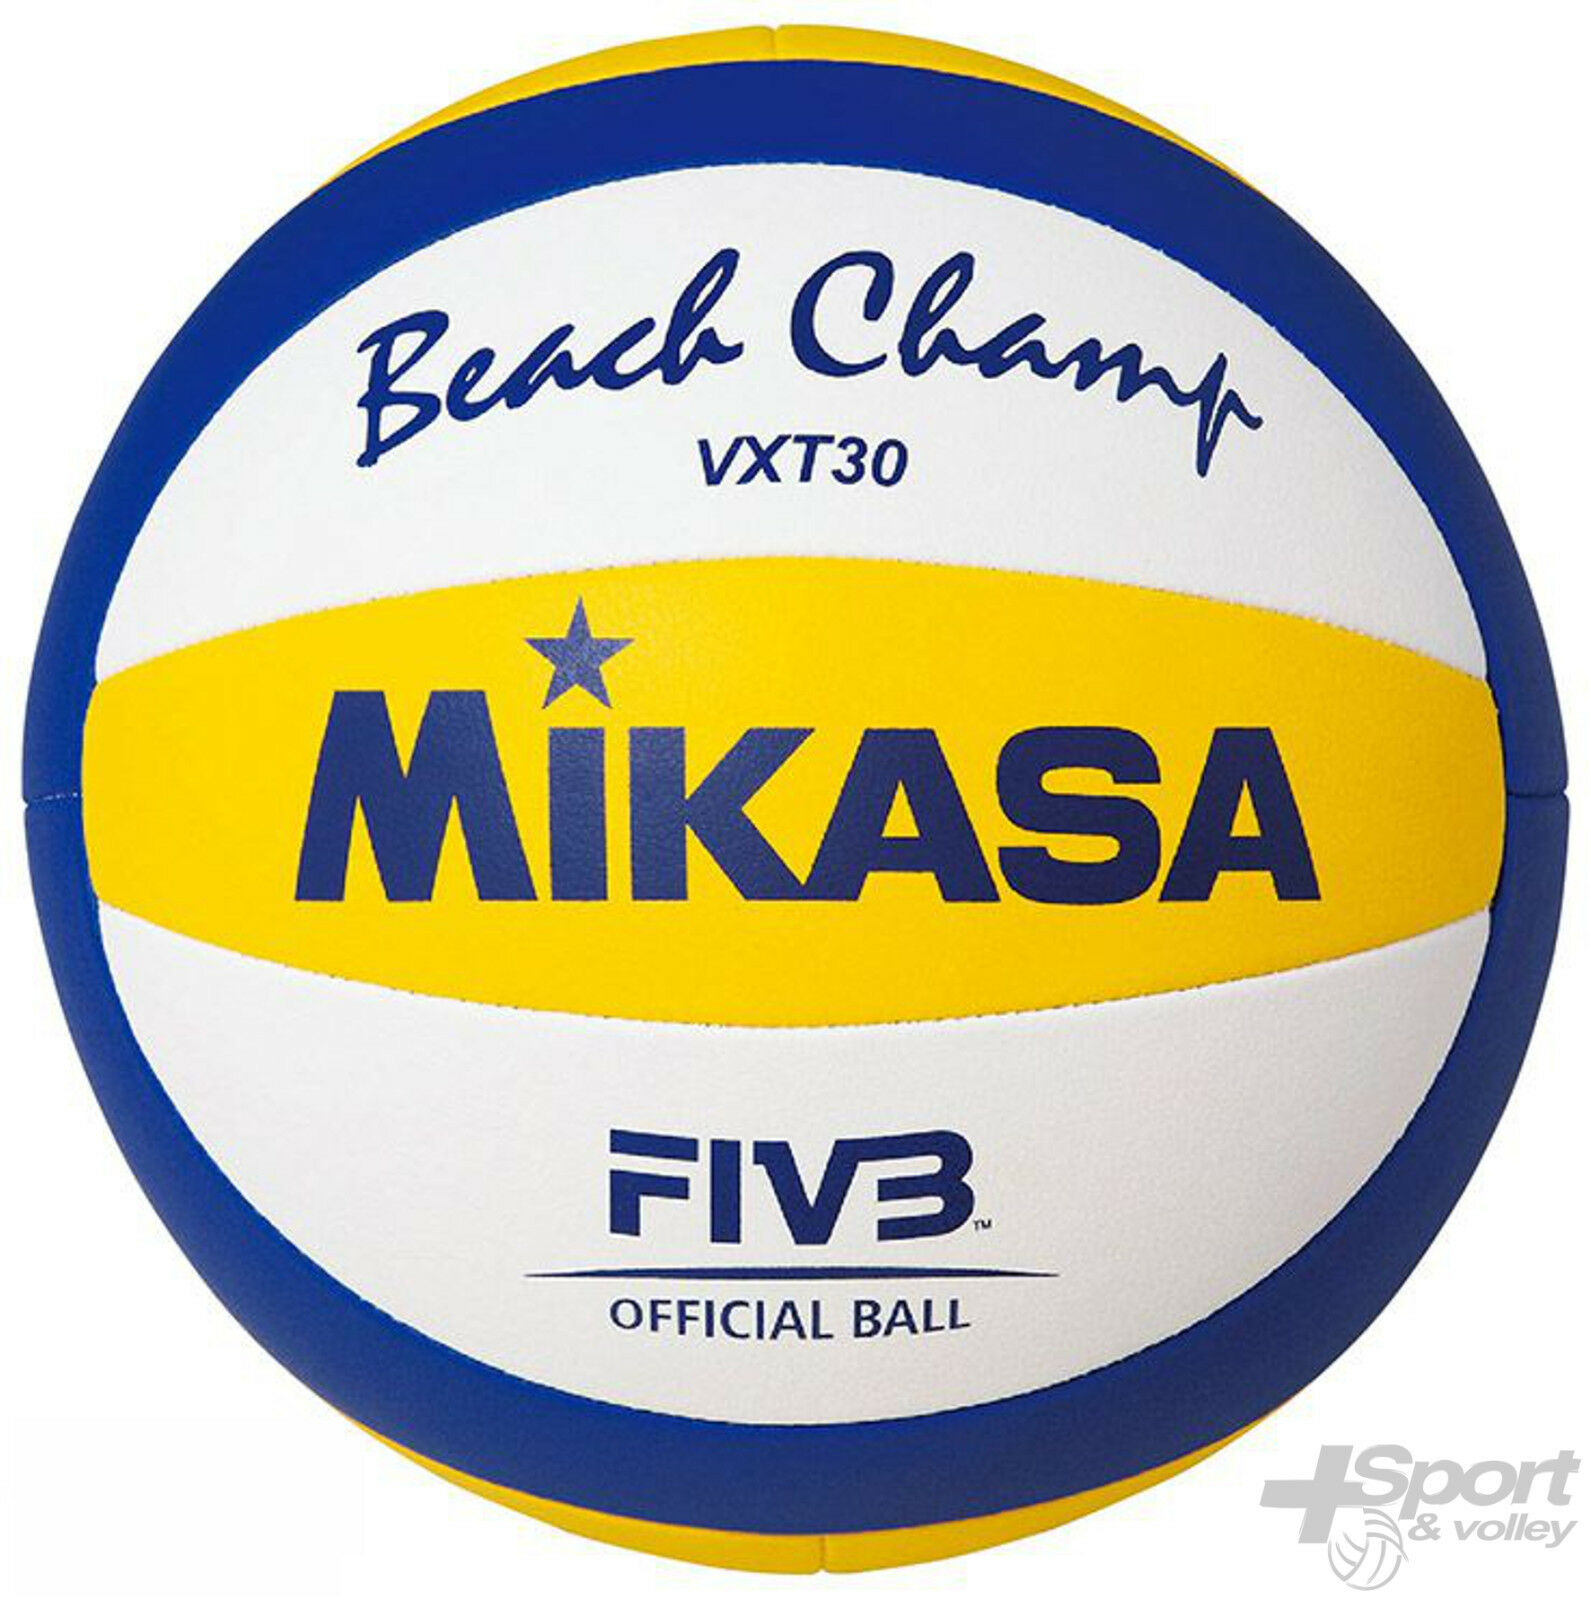 Ball Strand Volleyball Mikasa Strand Champ VXT30